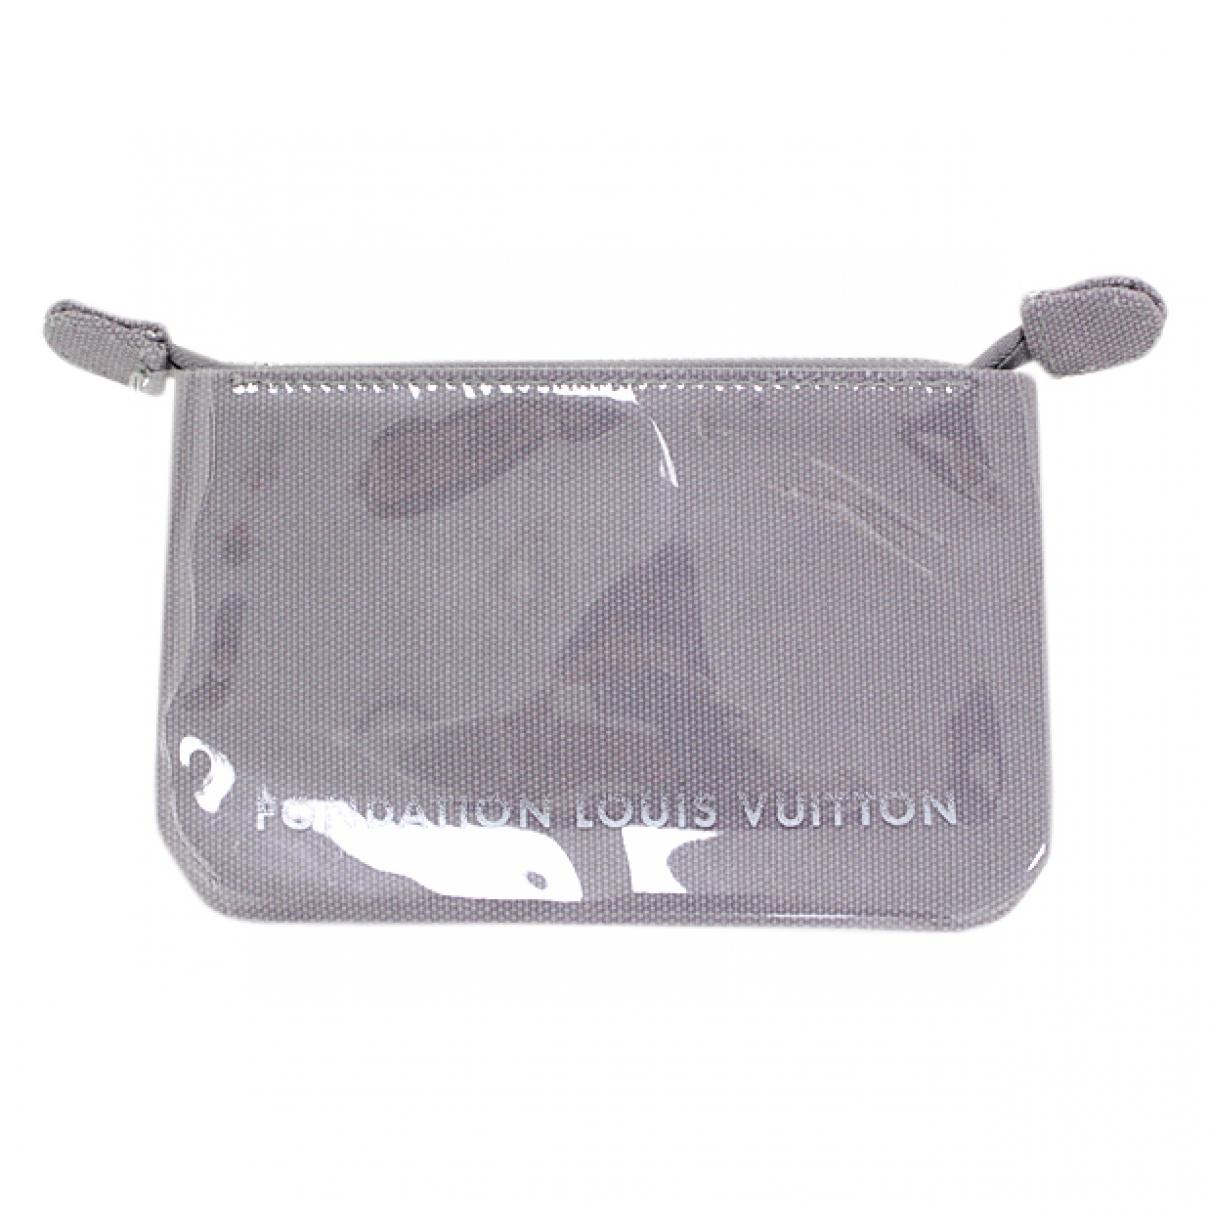 Louis Vuitton \N Grey Purses, wallet & cases for Women \N